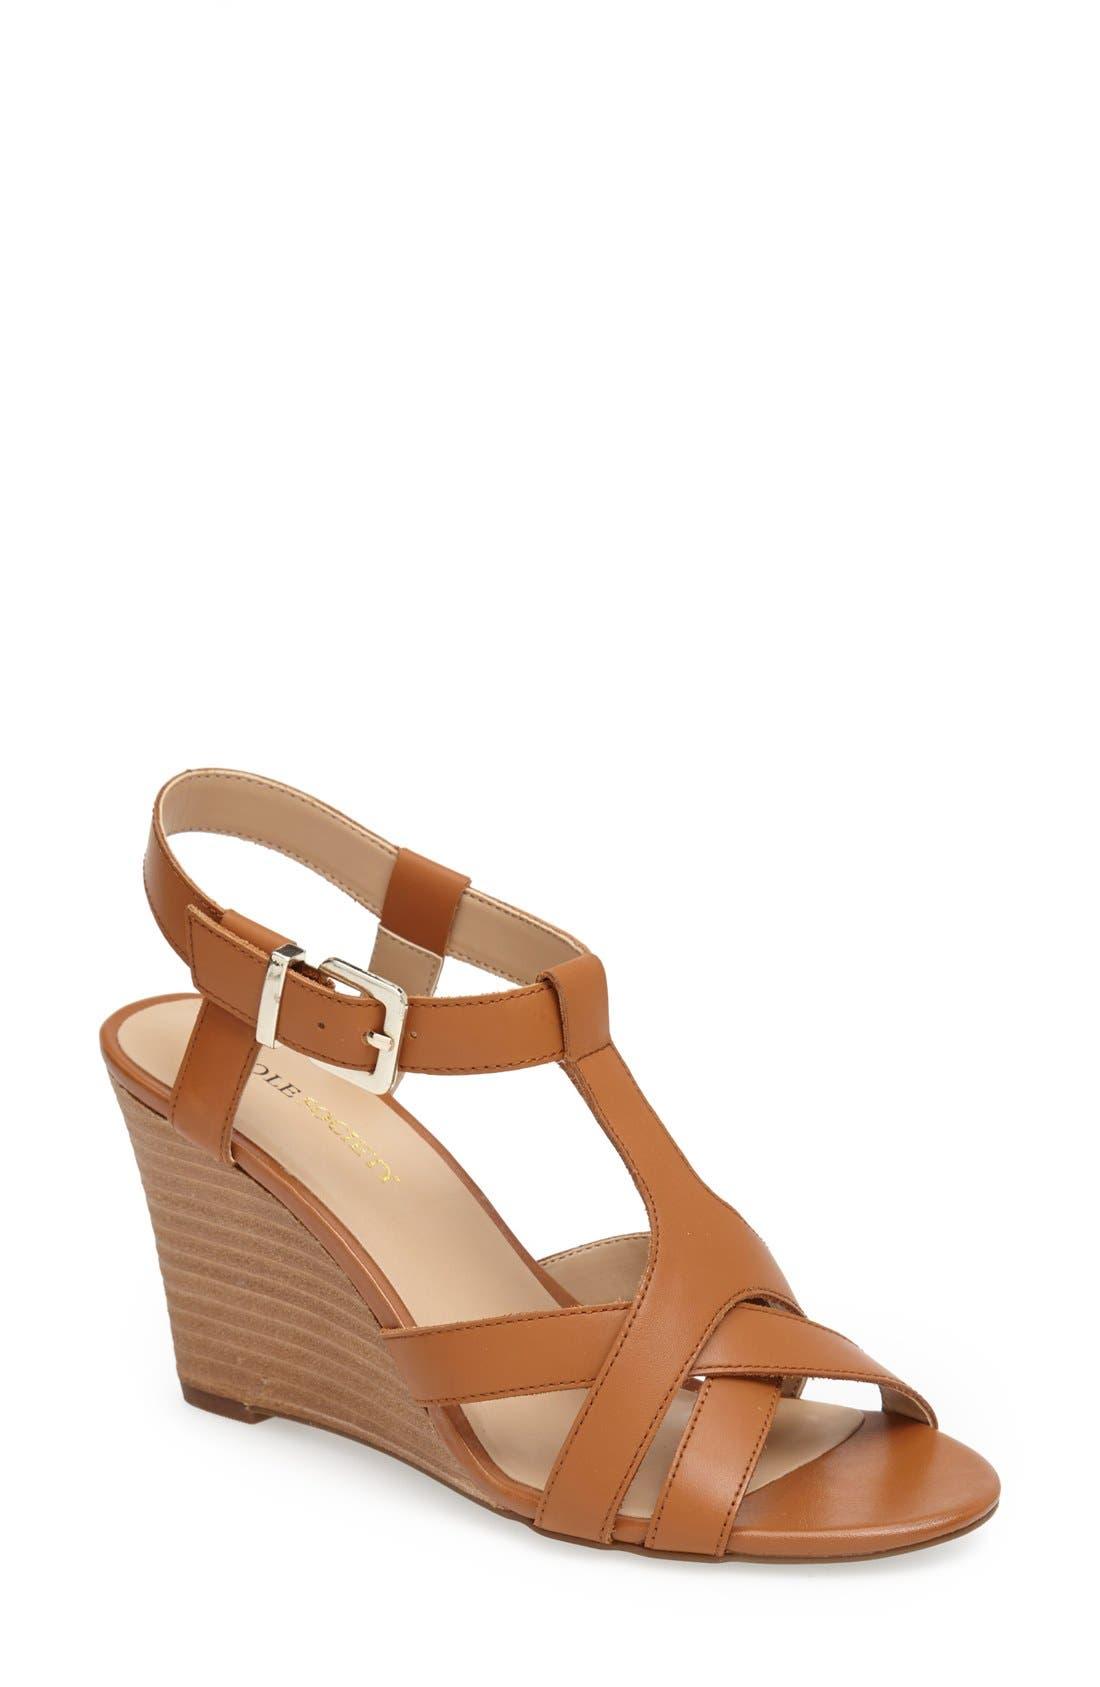 Main Image - Sole Society 'Metsey' Wedge Sandal (Women)